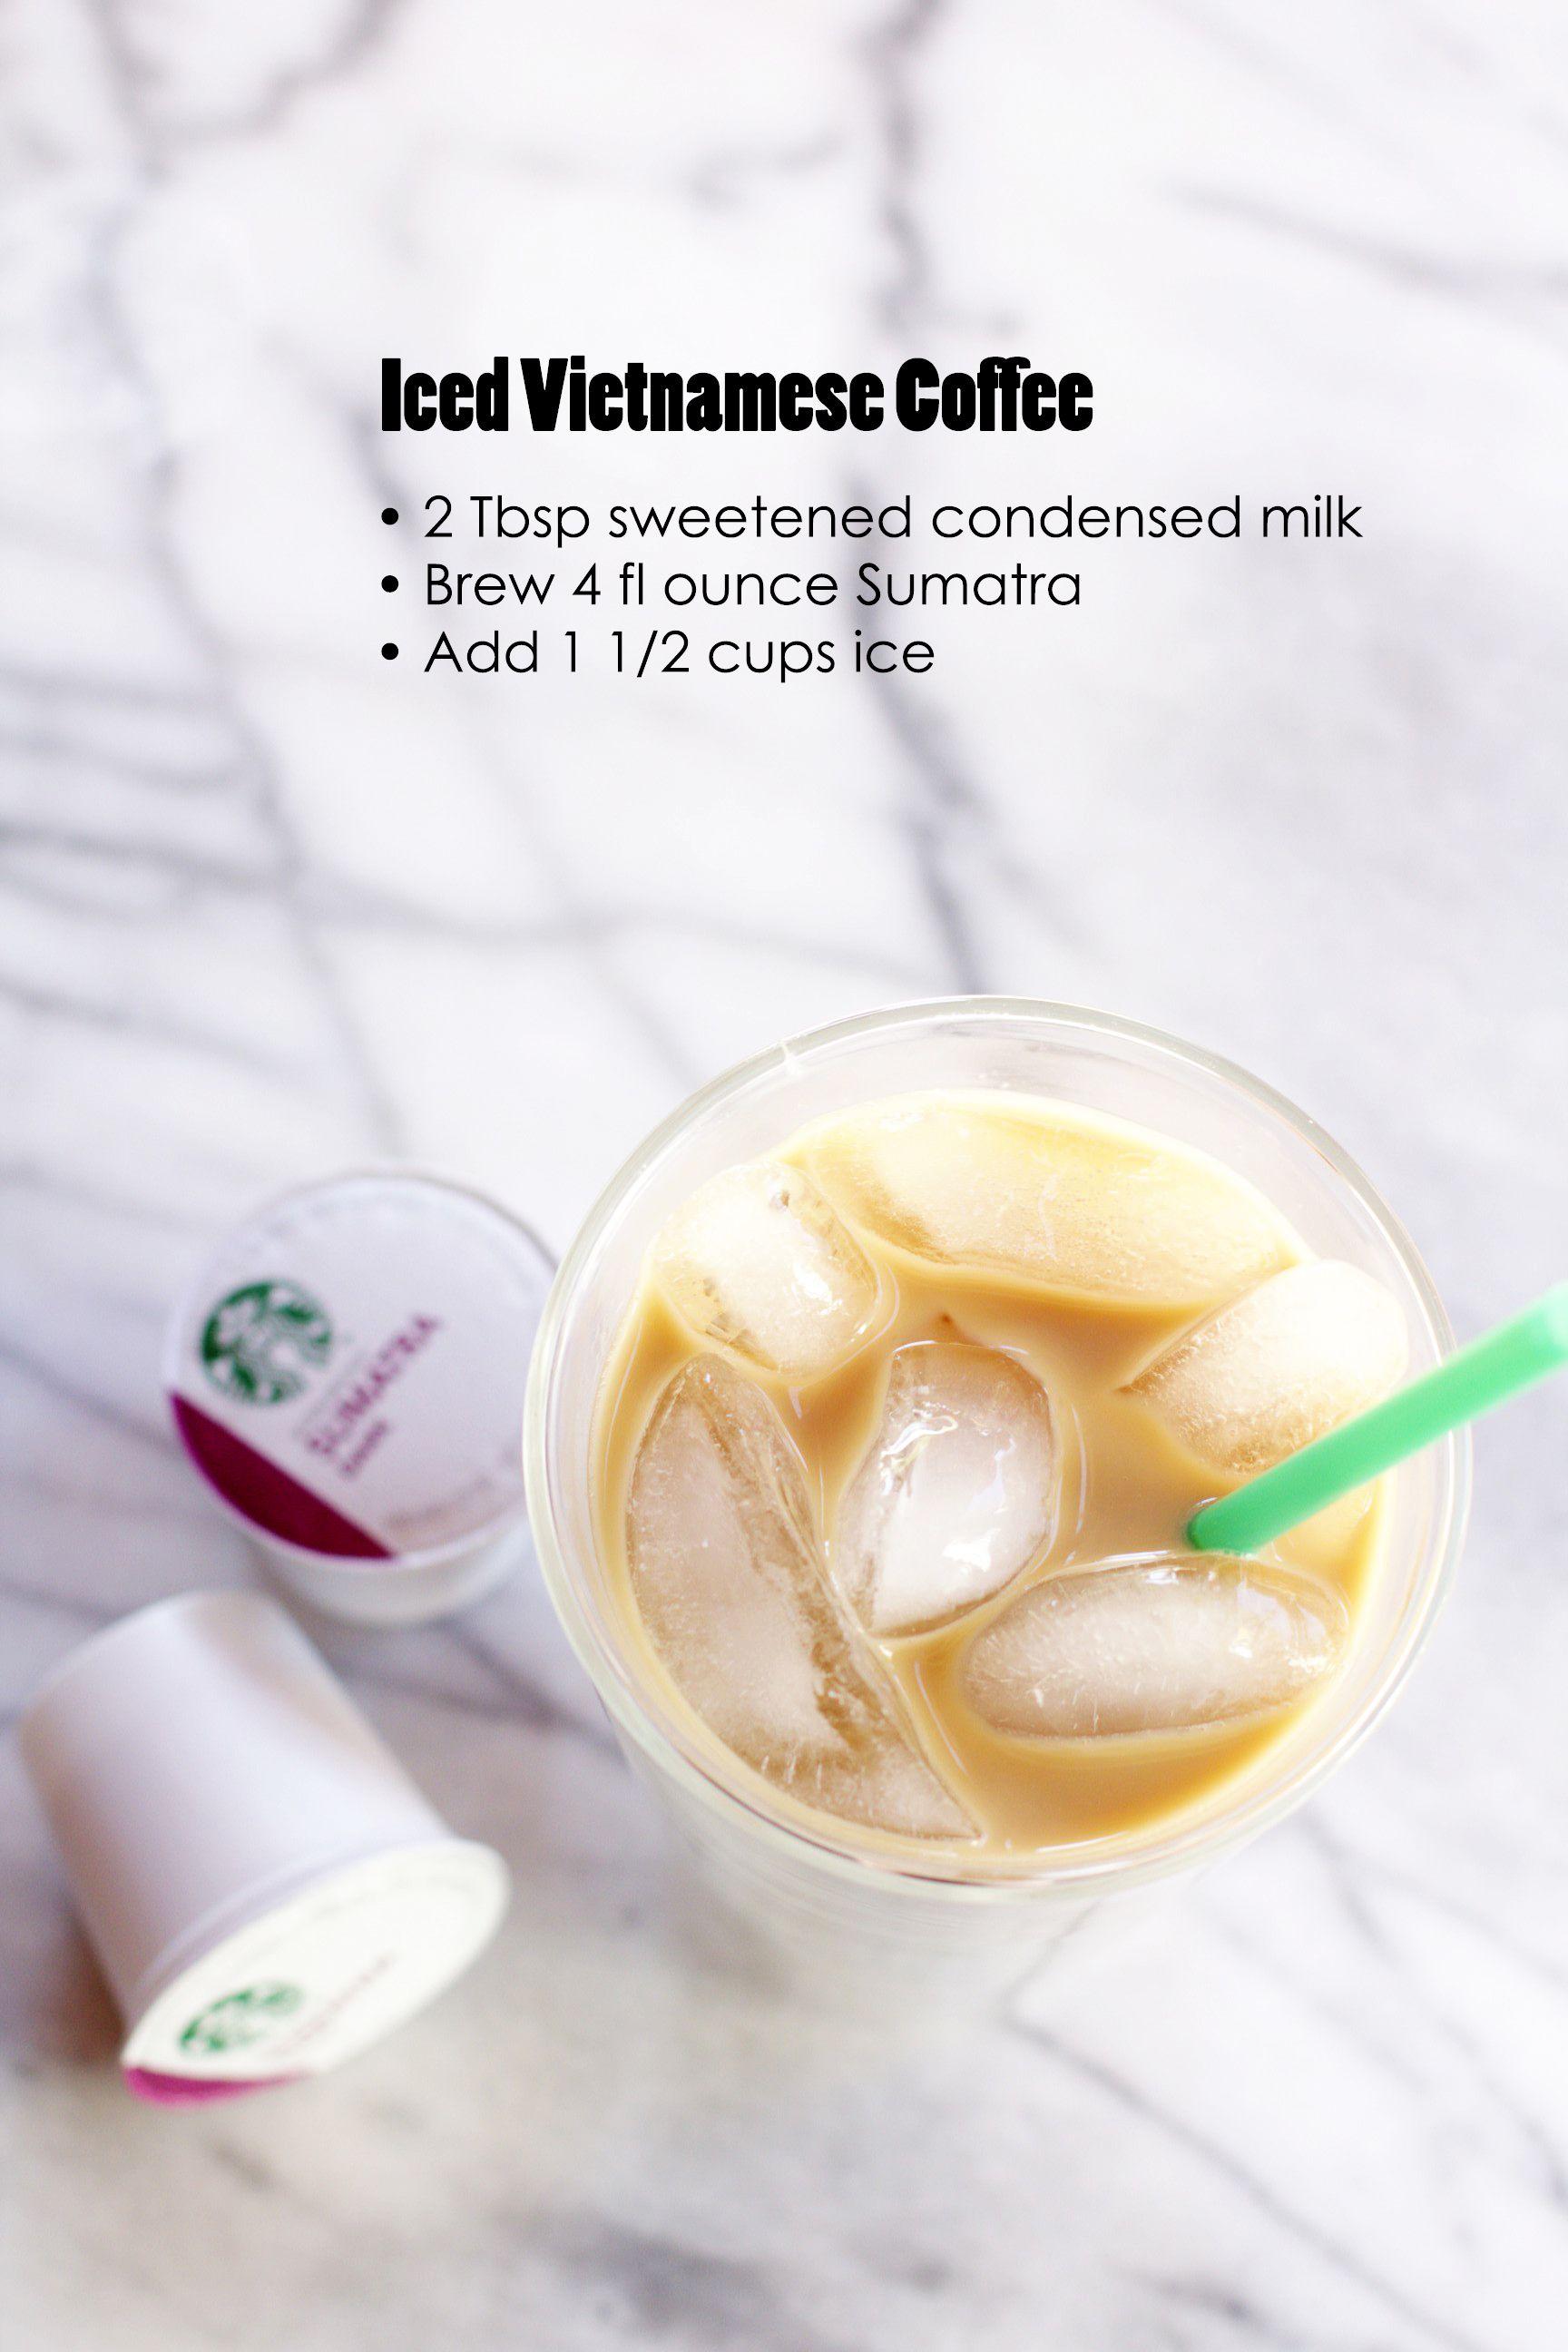 Ideas In Action Blog Coffee Recipes Keurig Recipes Coffee Addict